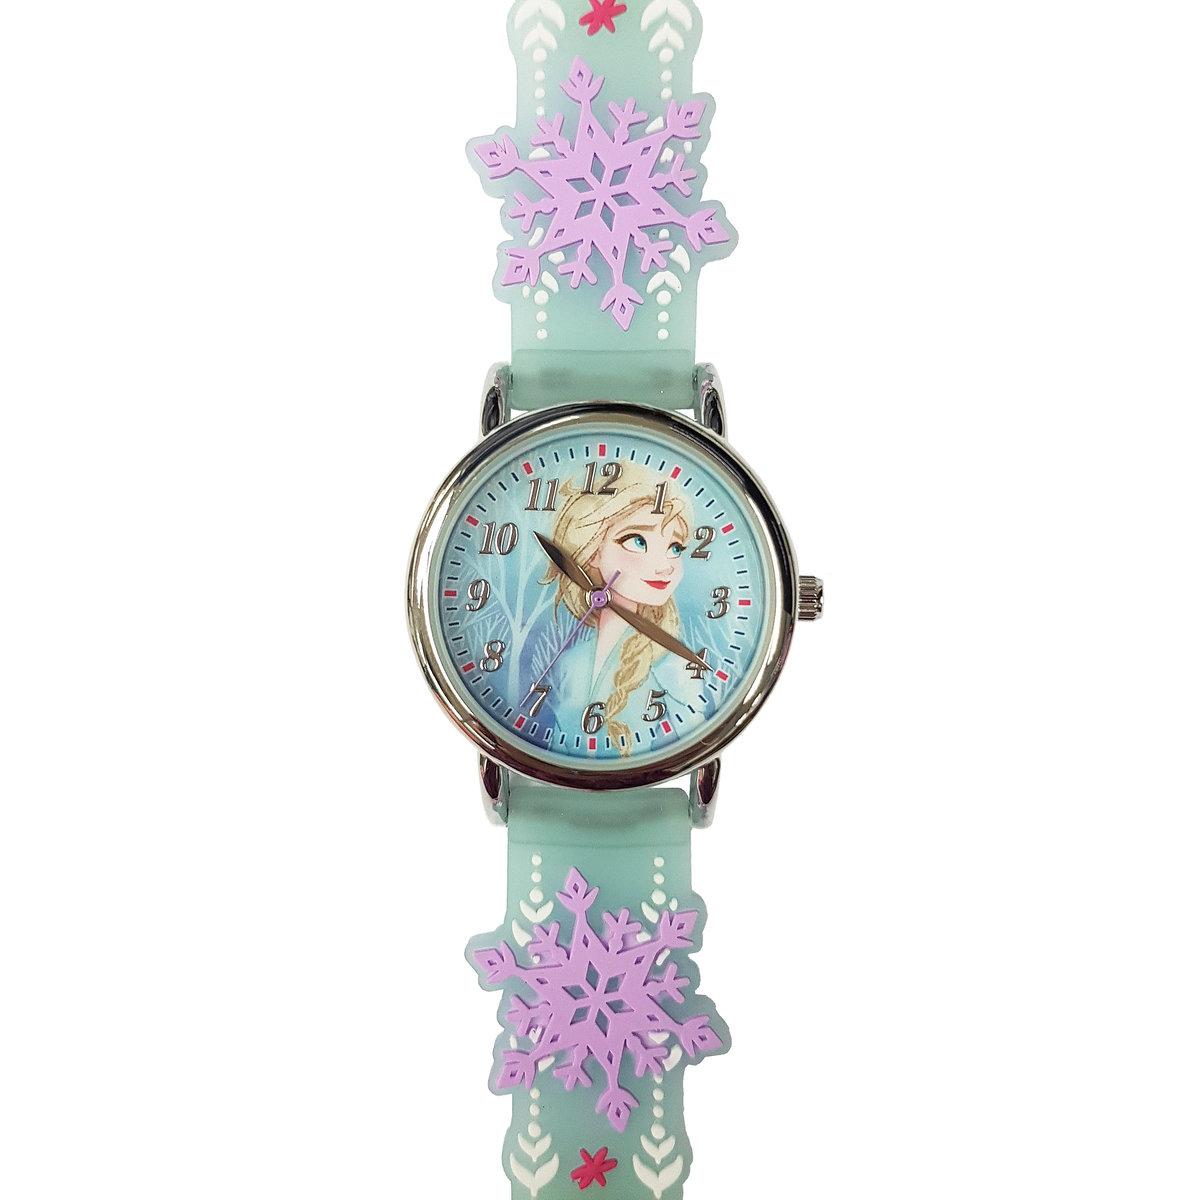 DISNEY FROZEN 2 - Luminous watch wrist watch - Elsa (Licensed by Disney)